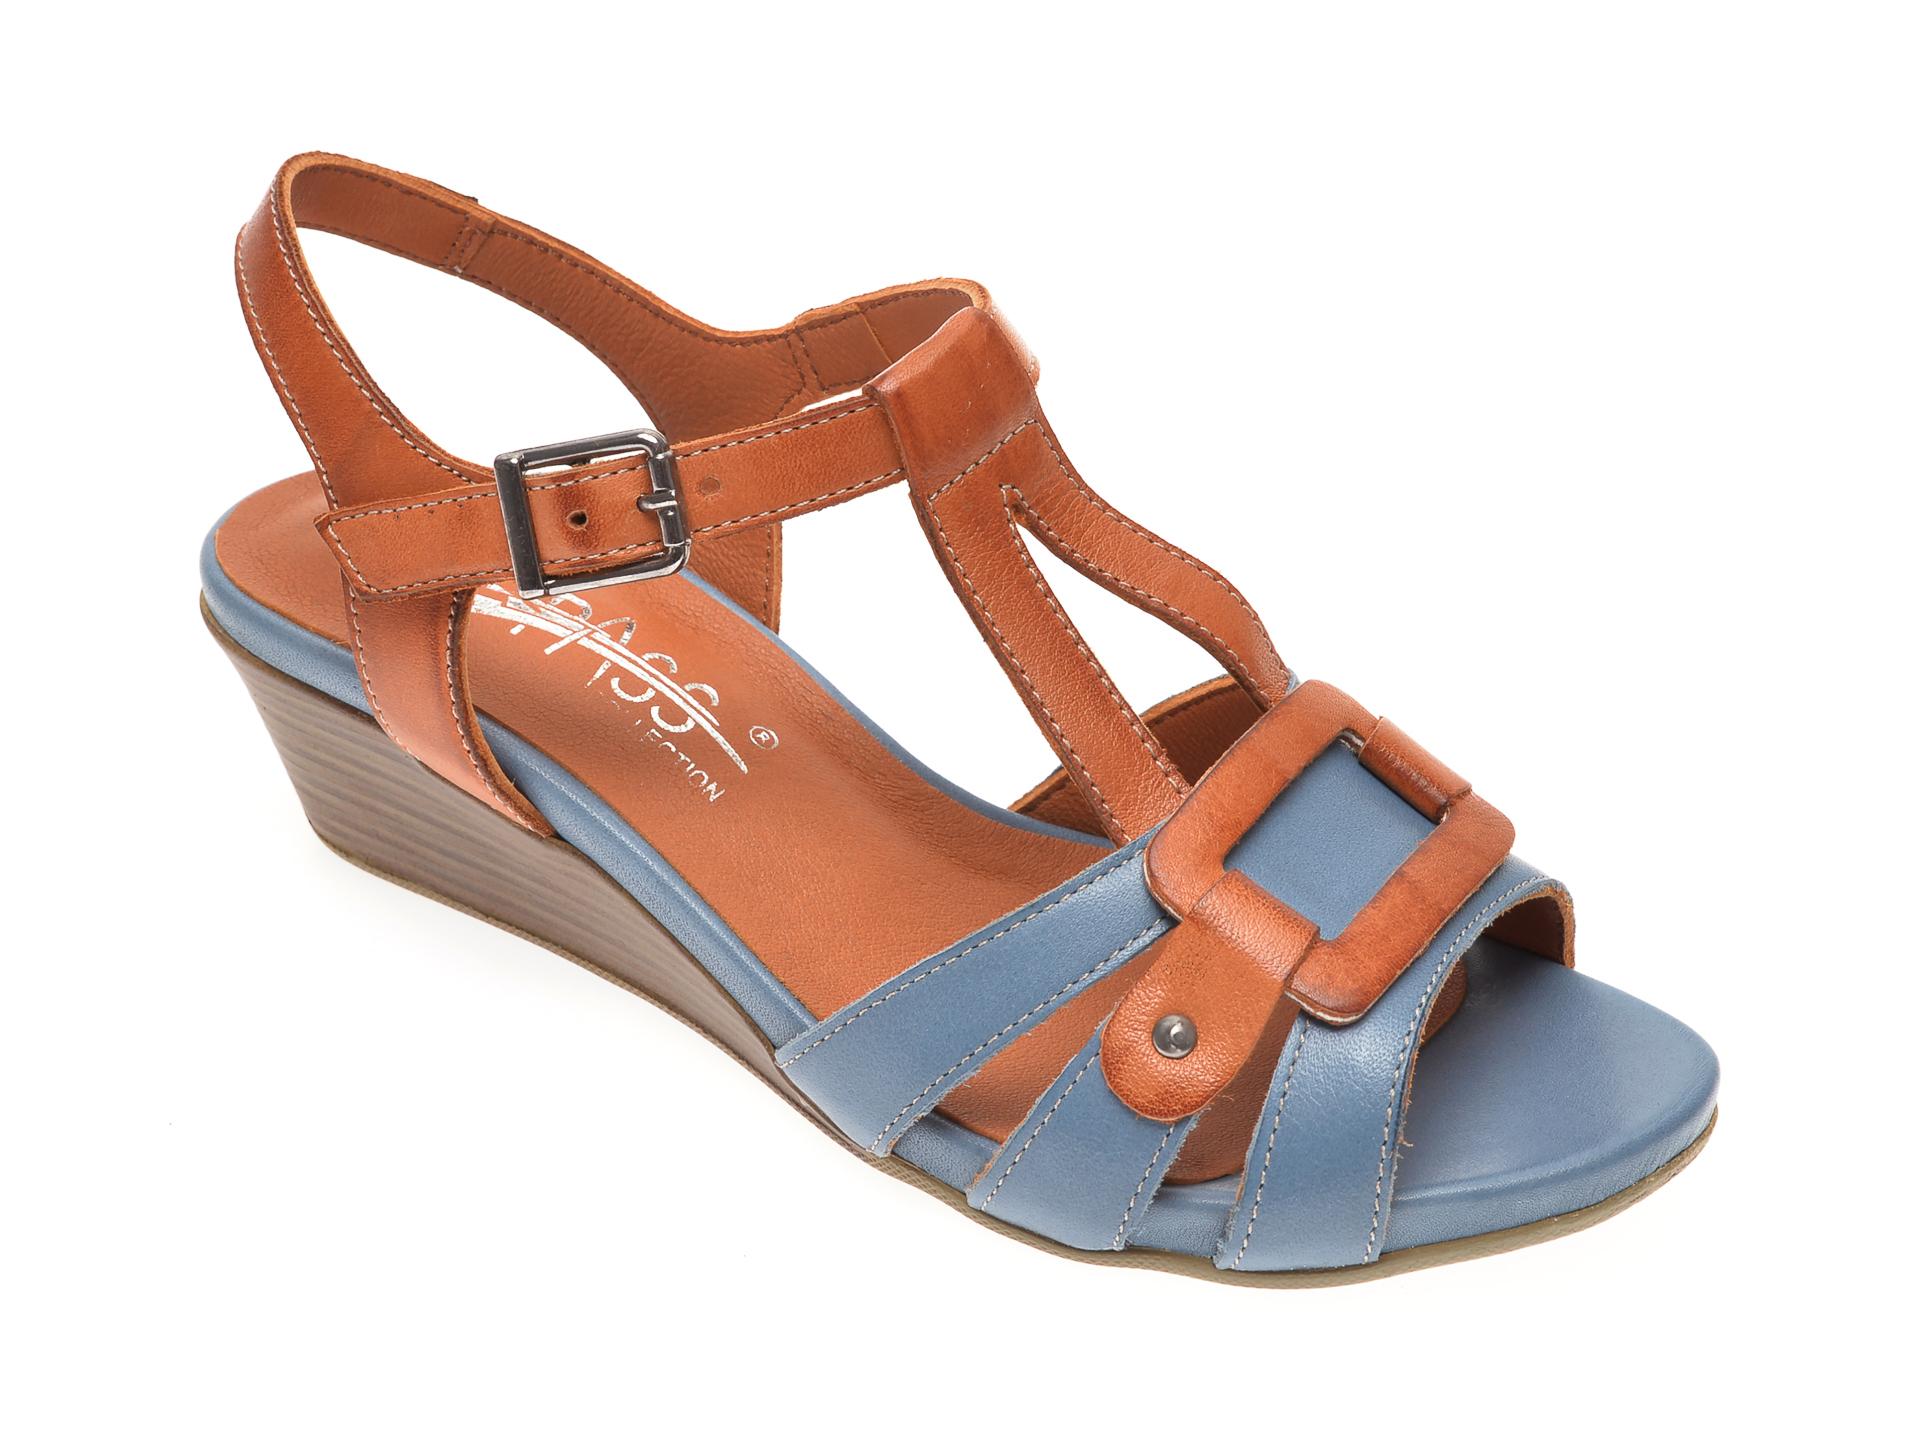 Sandale PASS COLLECTION albastre, 6133, din piele naturala